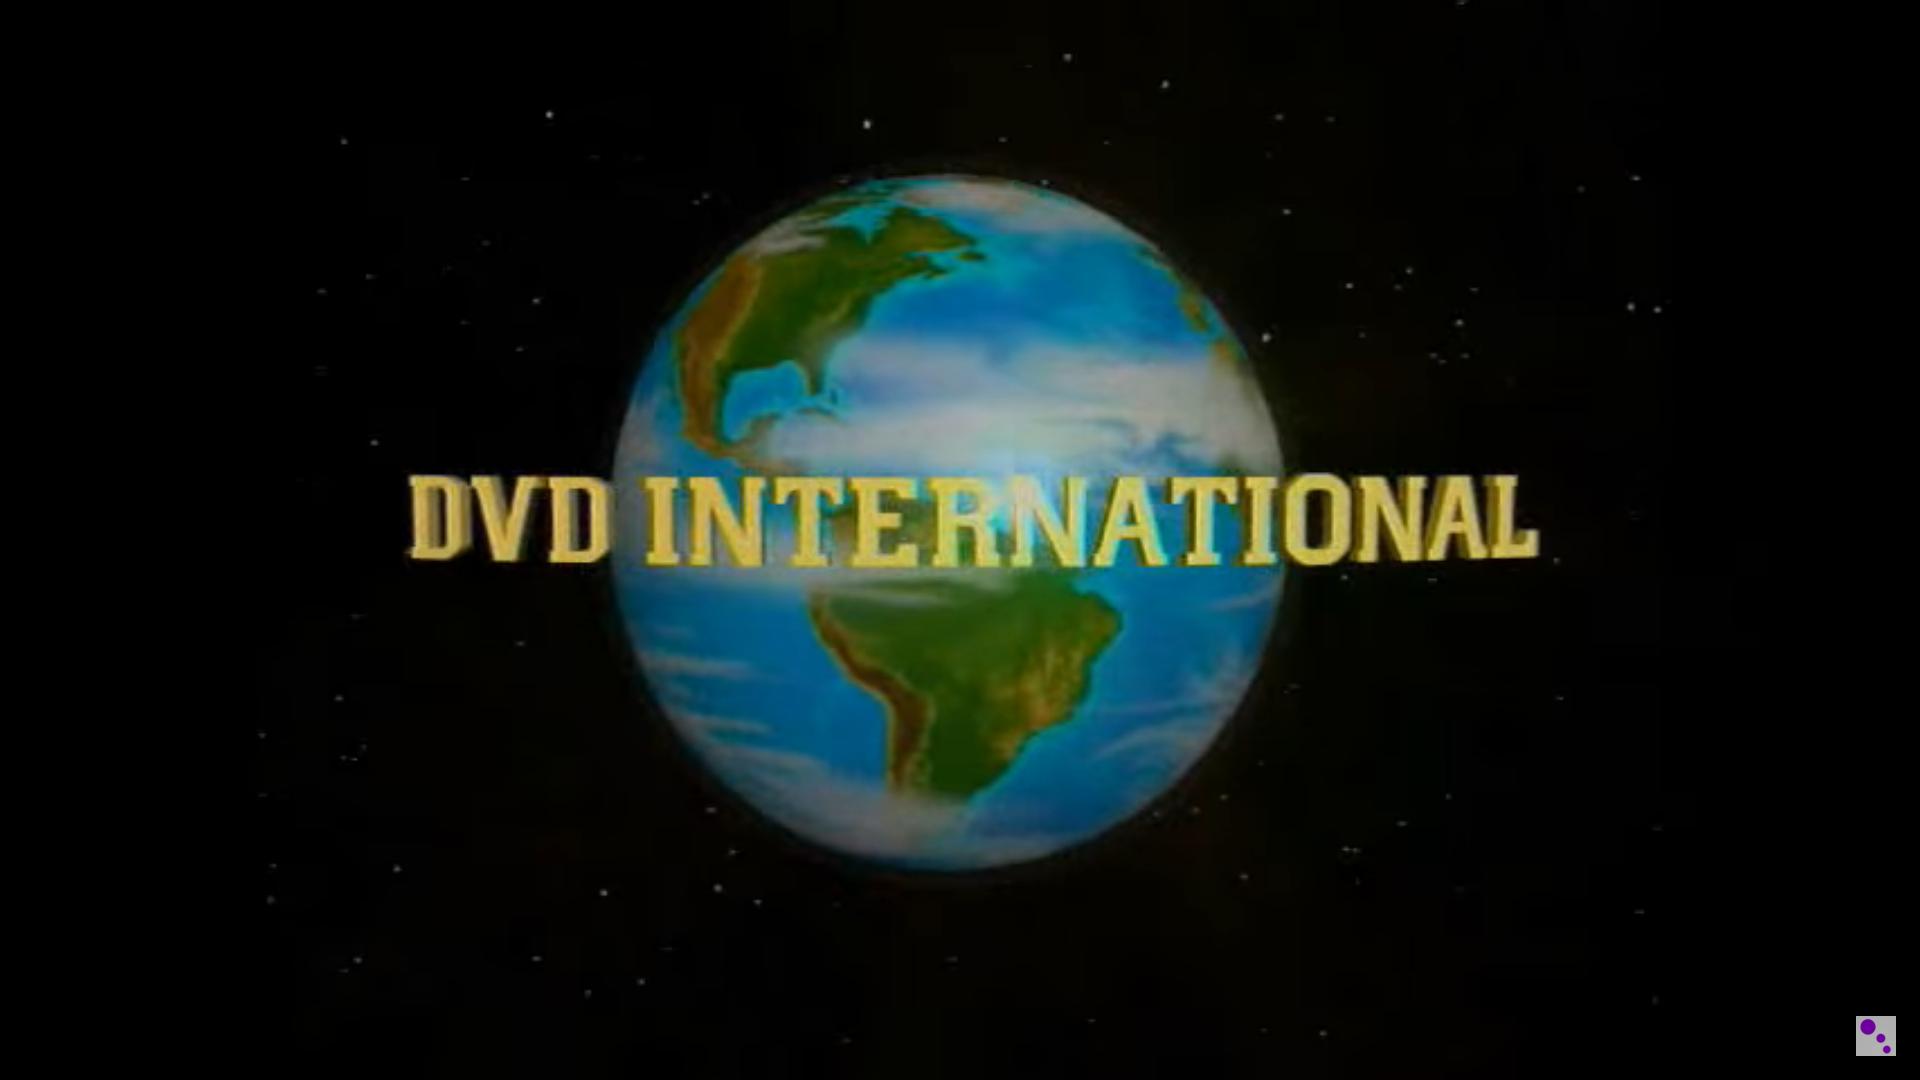 DVD International